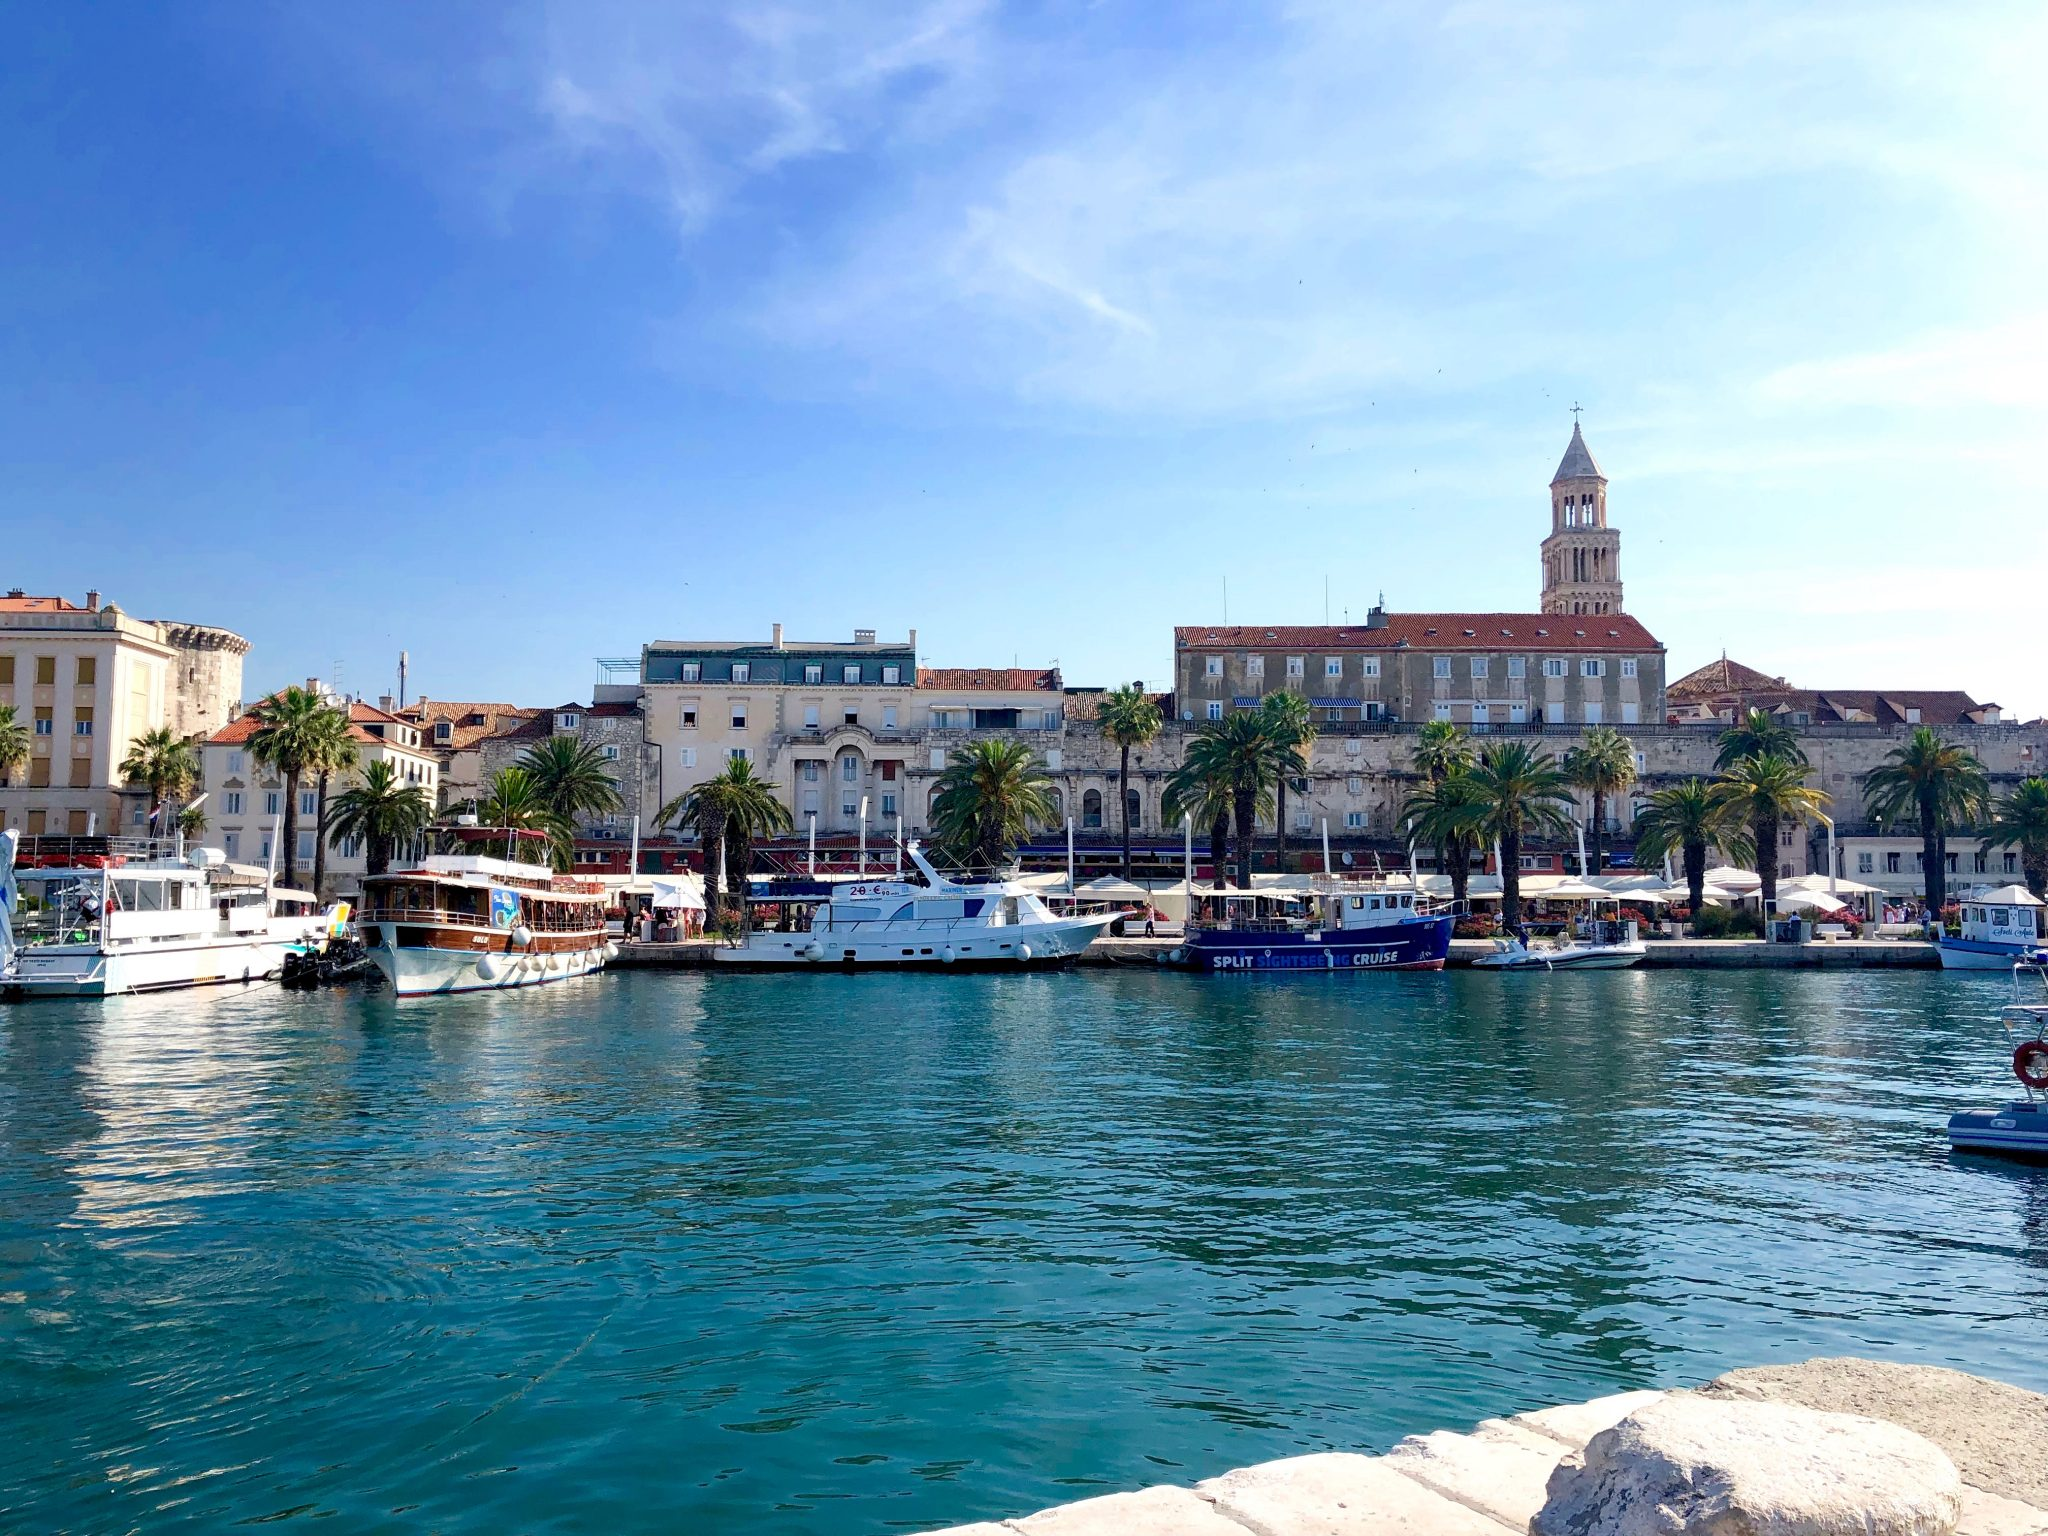 View of Split